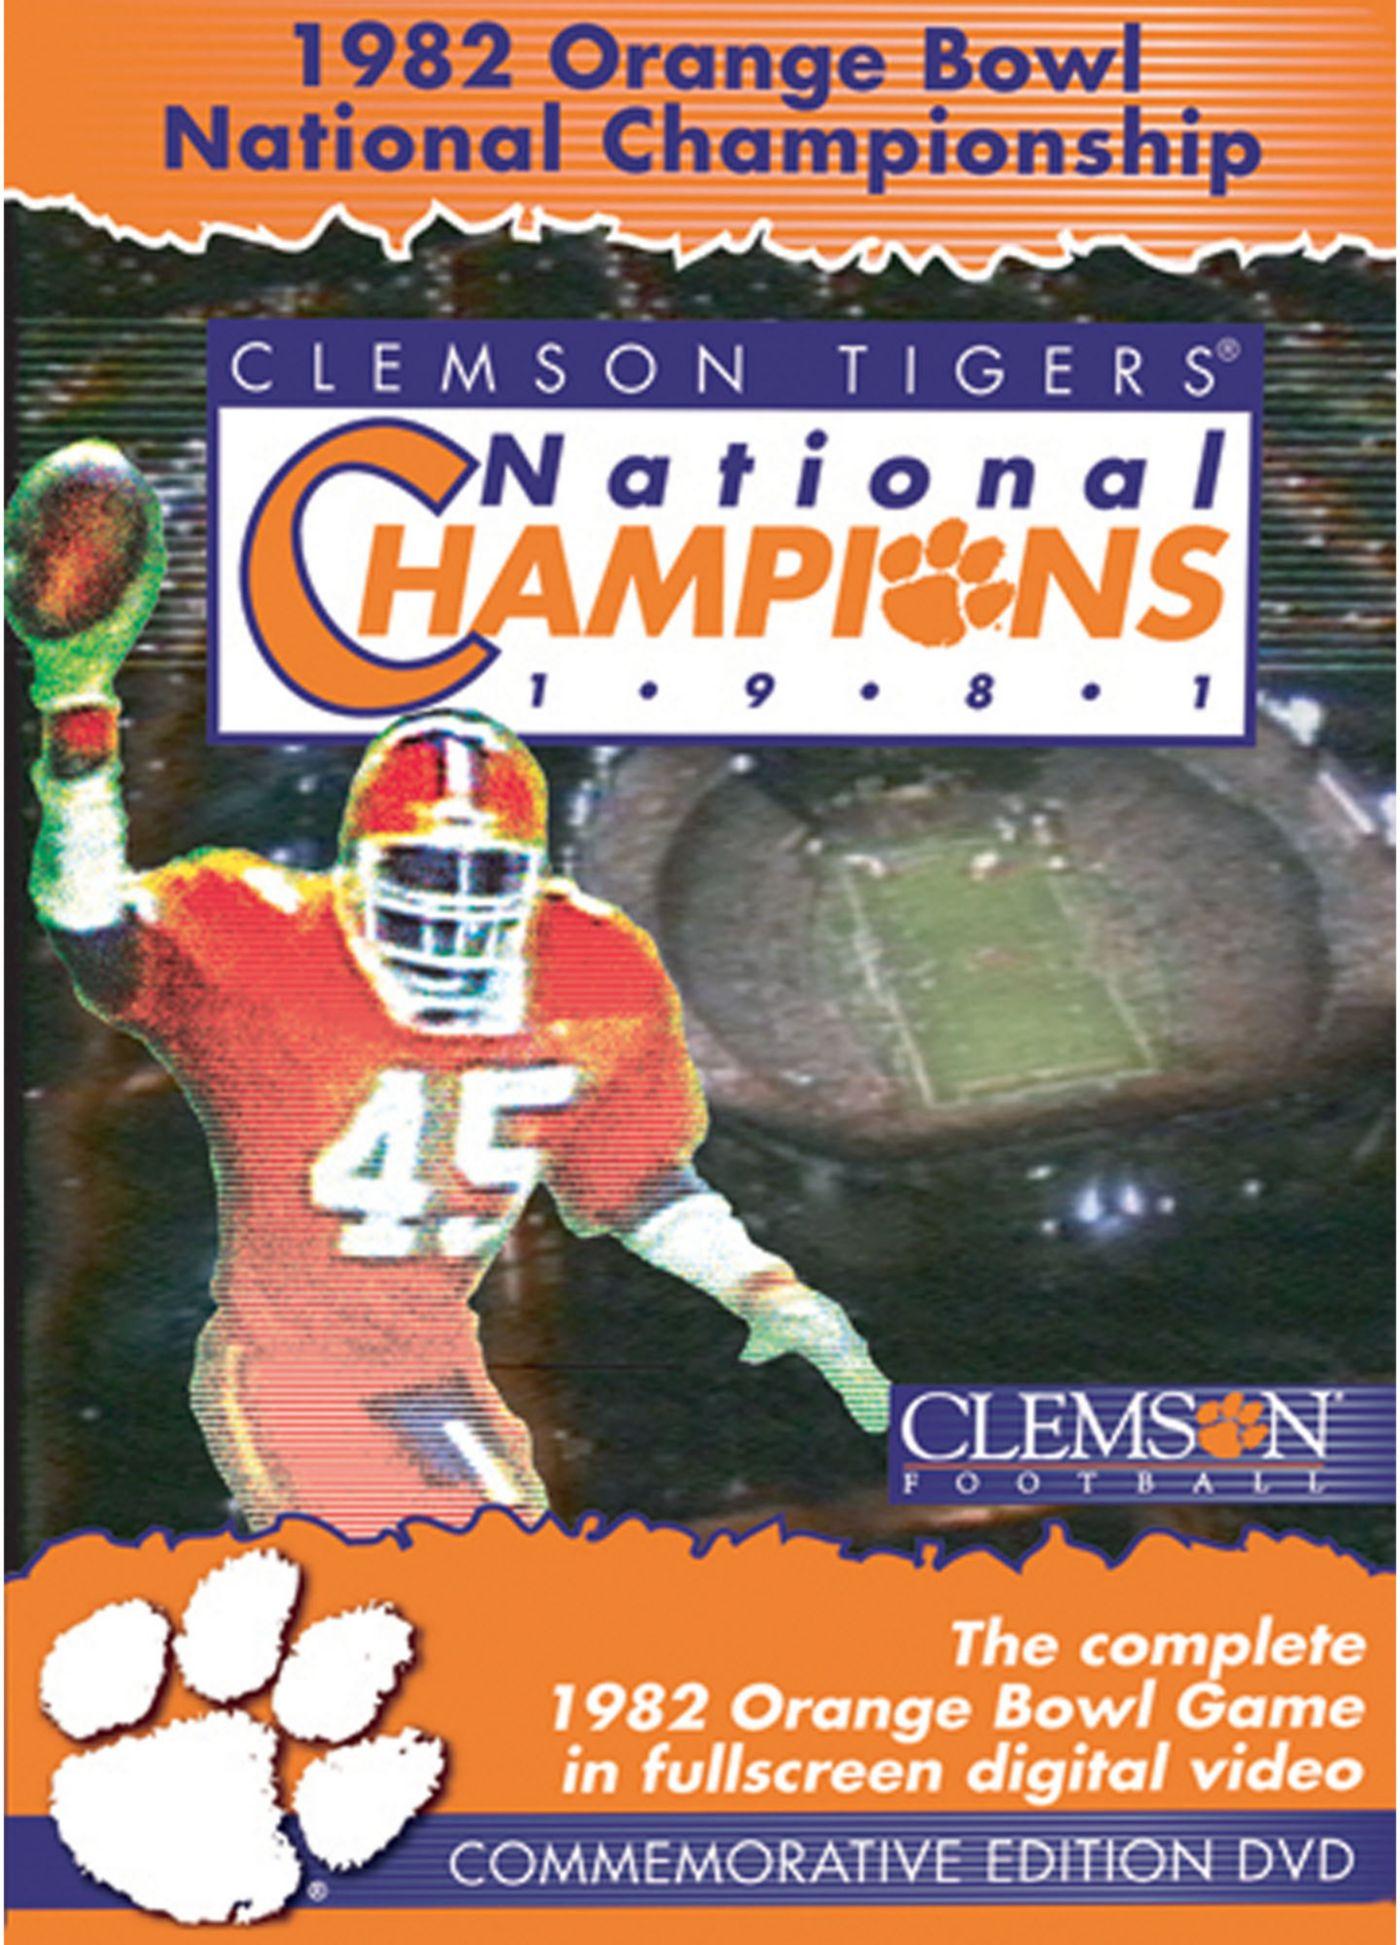 1982 FedEx Orange Bowl National Championship Game DVD